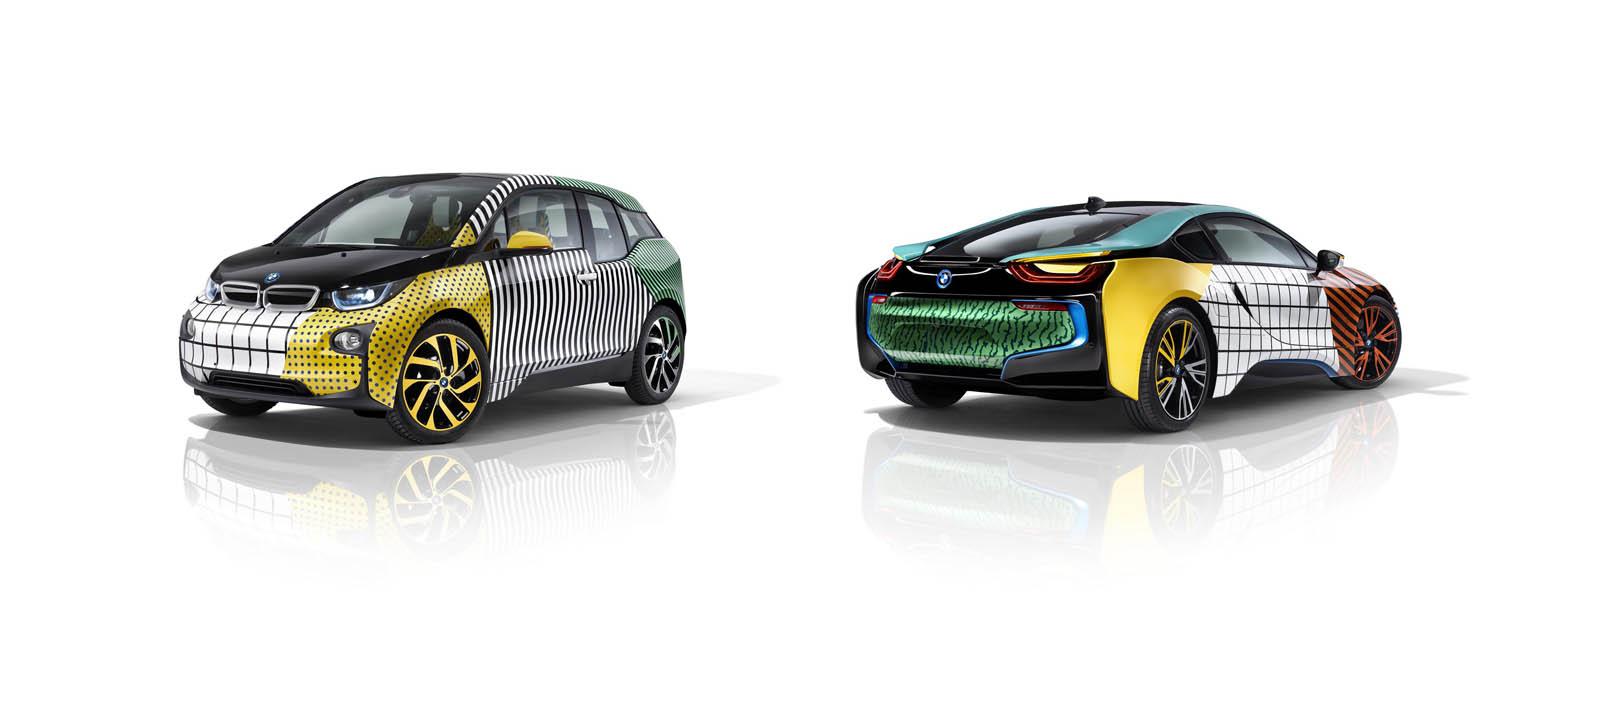 BMW i3 and i8 by Garage Italia Customs (17)